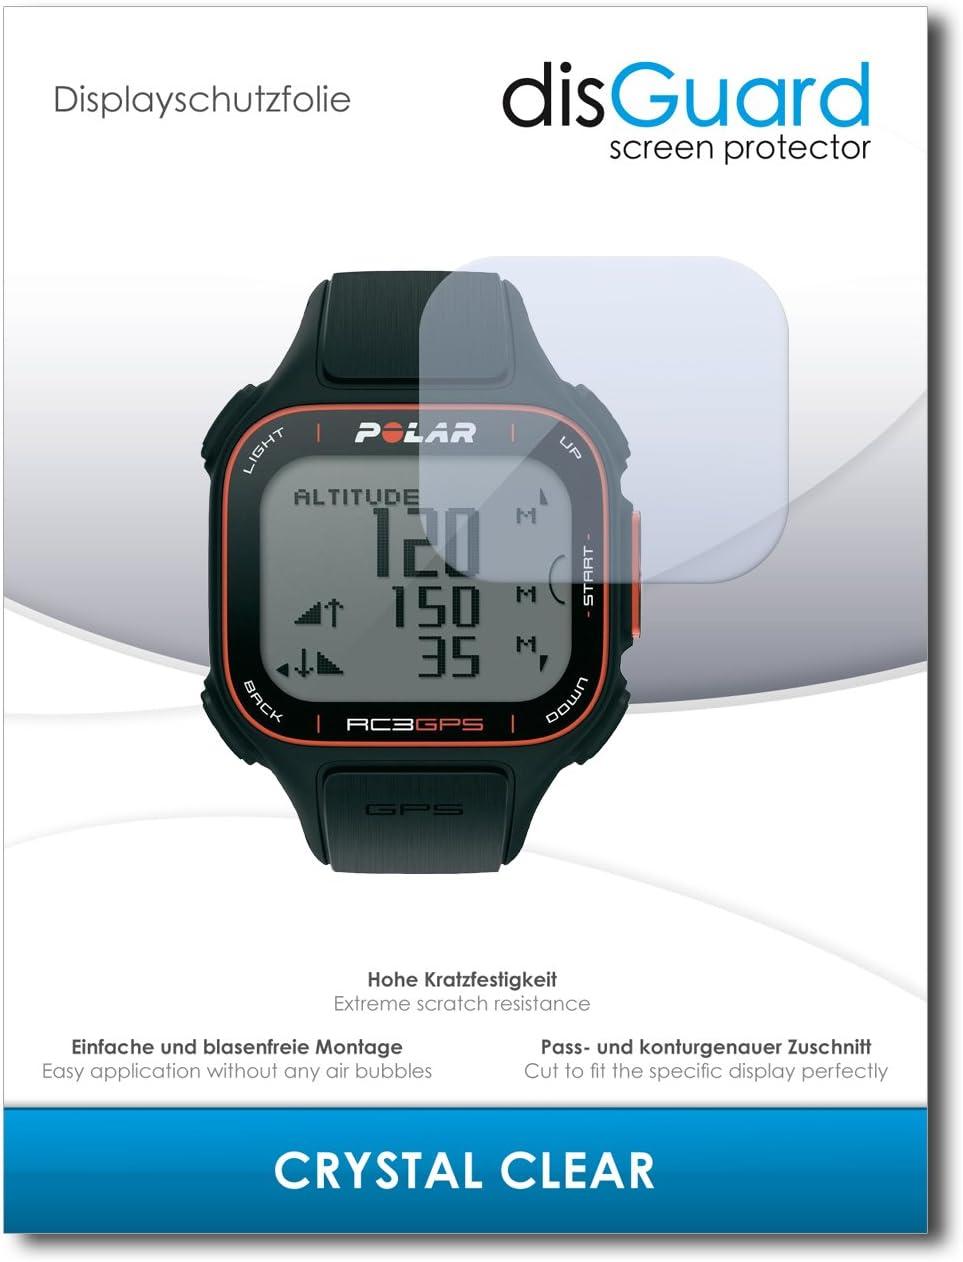 disGuard® Protector de Pantalla [Crystal Clear] compatibile con Polar RC3 GPS [2 Piezas] Cristal, Transparente, Invisible, Anti-Arañazos, Anti-Huella Dactilar - Película Protectora